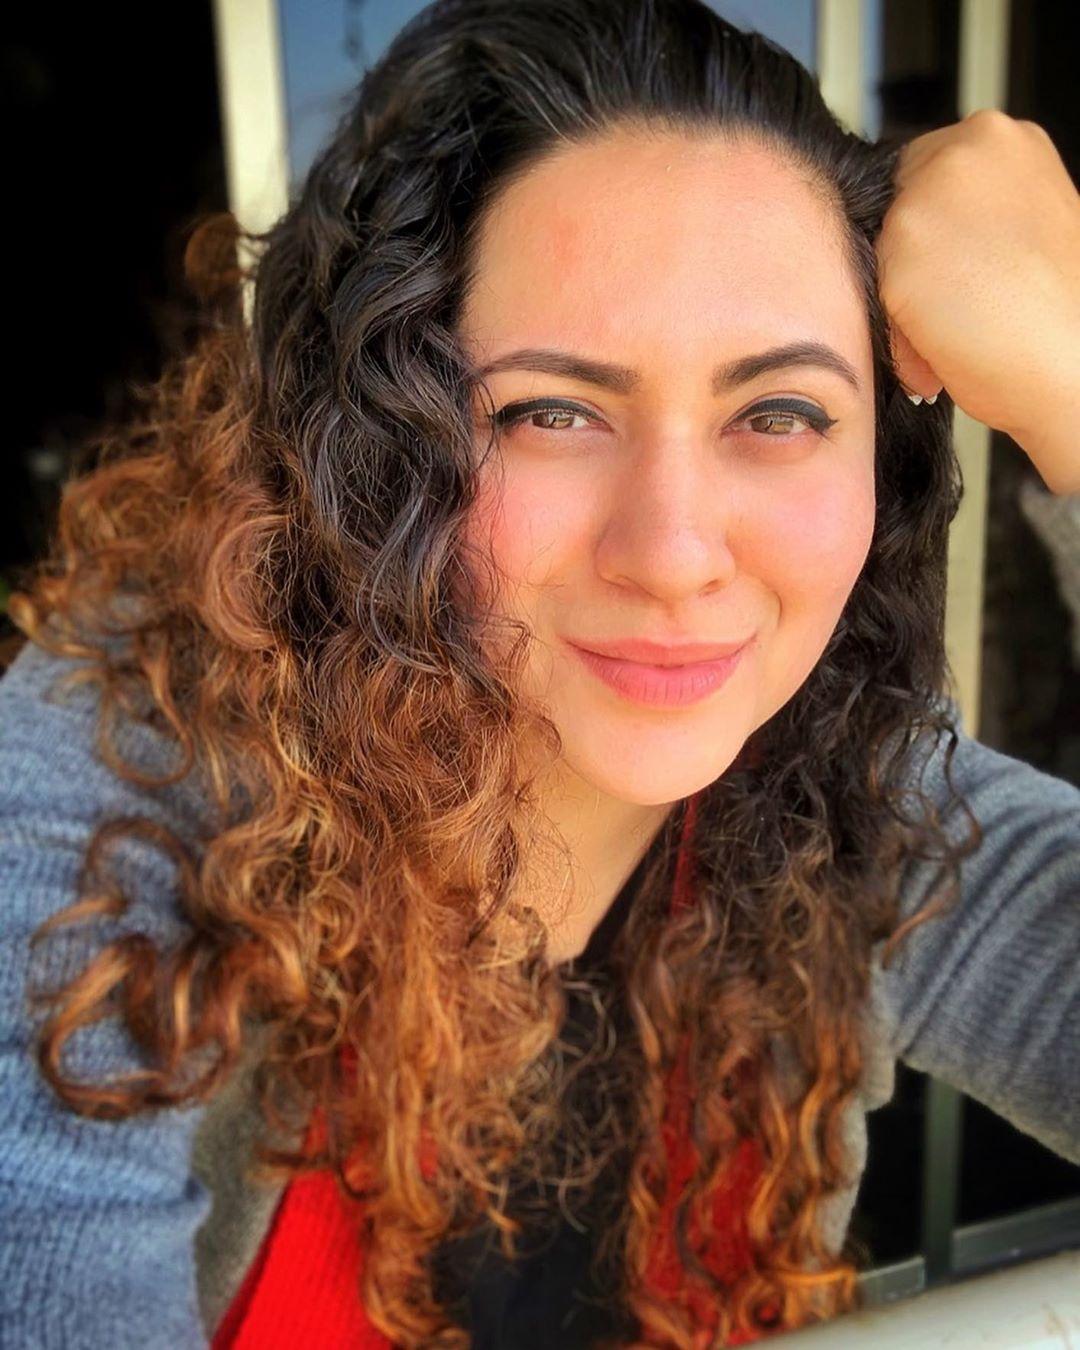 Ekta Sandhir Profile| Contact Details (Phone number, Instagram, TikTok, Facebook, Email address)